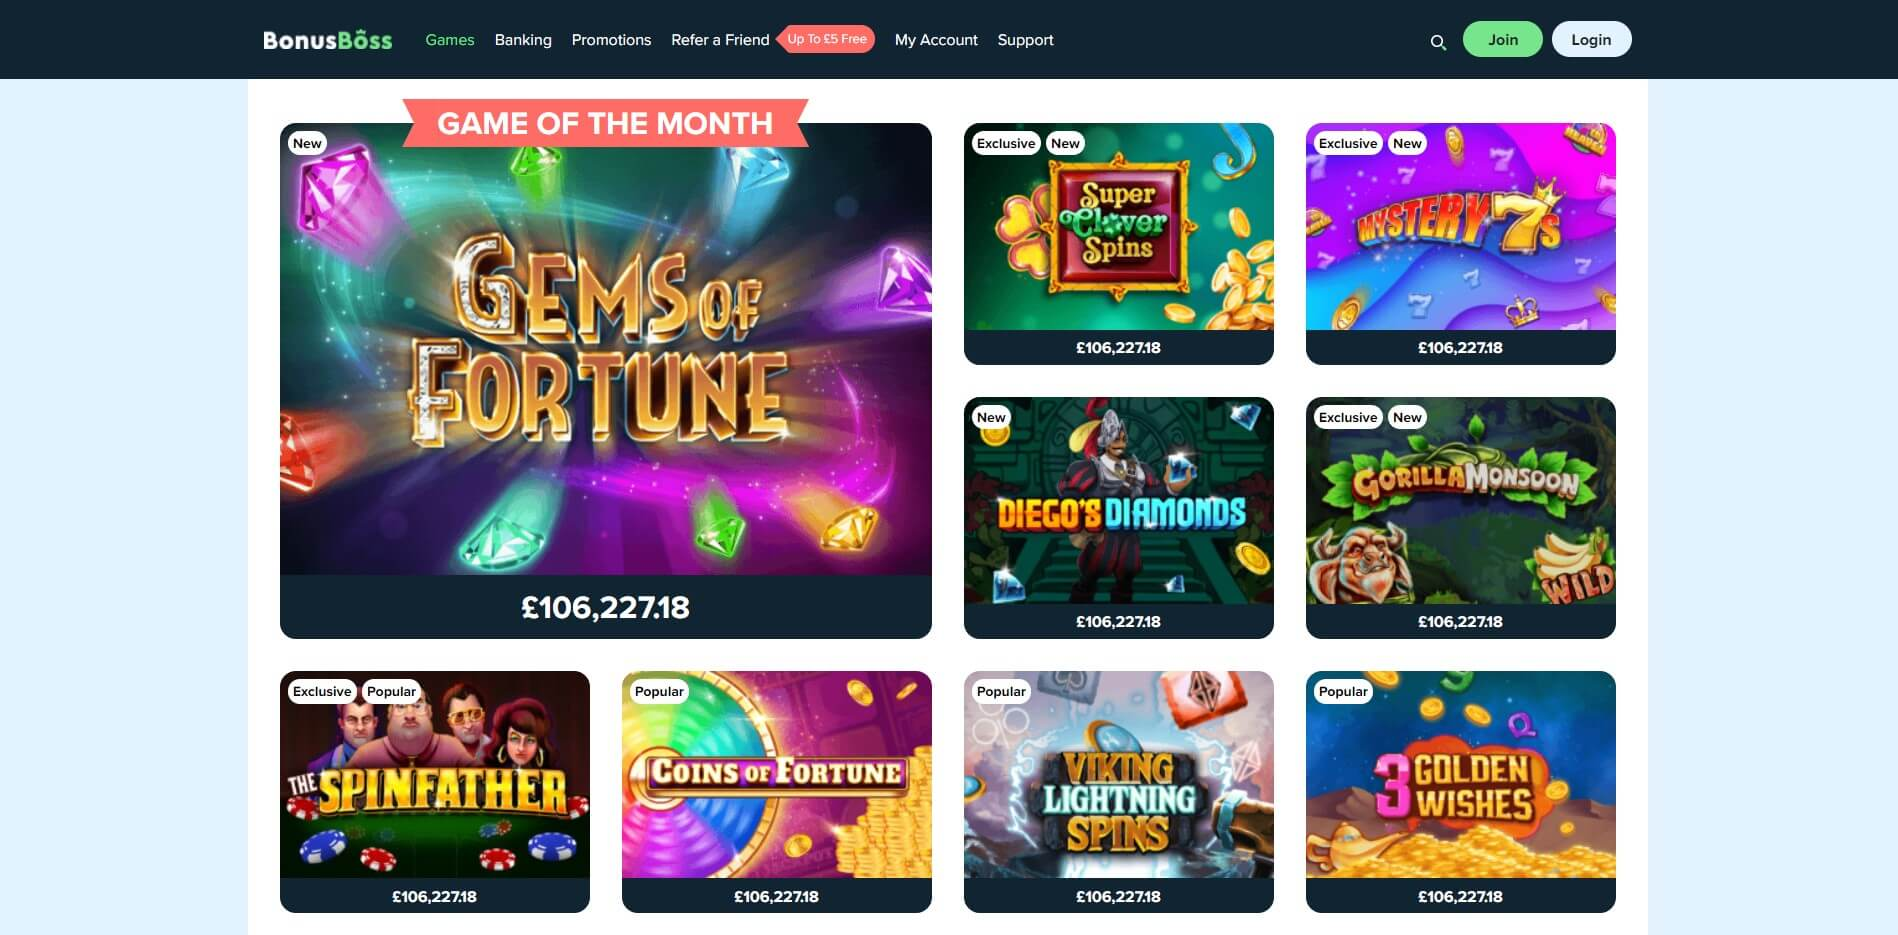 Games at BonusBoss Casino